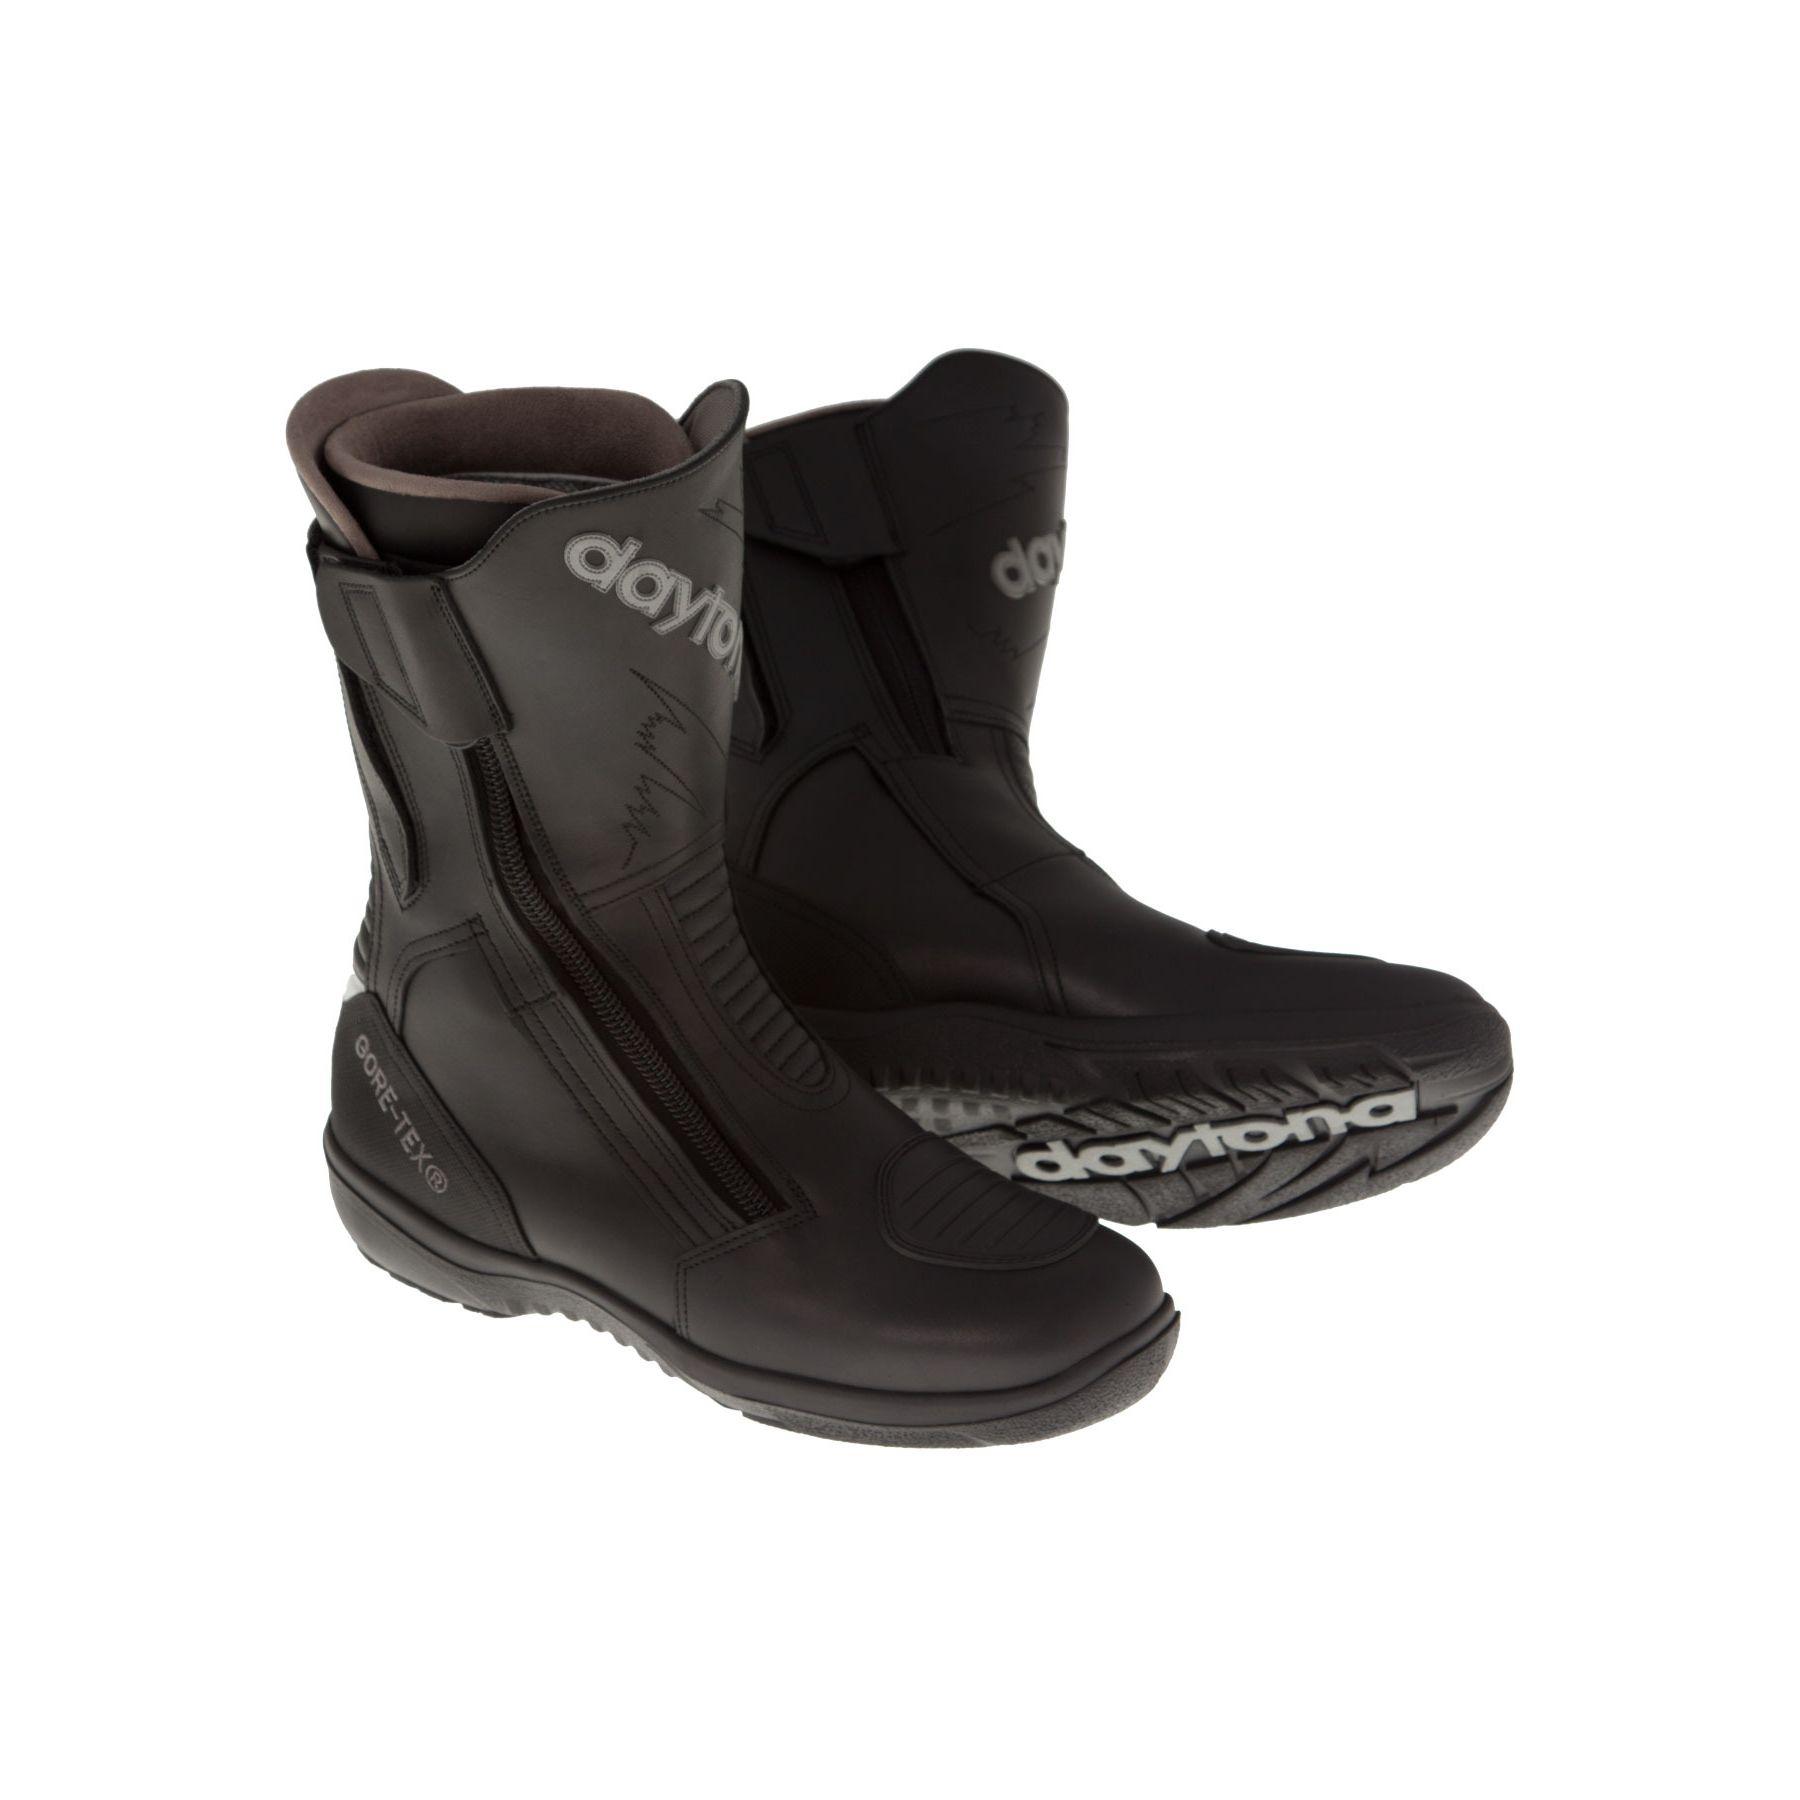 daytona_road_star_gtx_boots_1800x1800.jpg